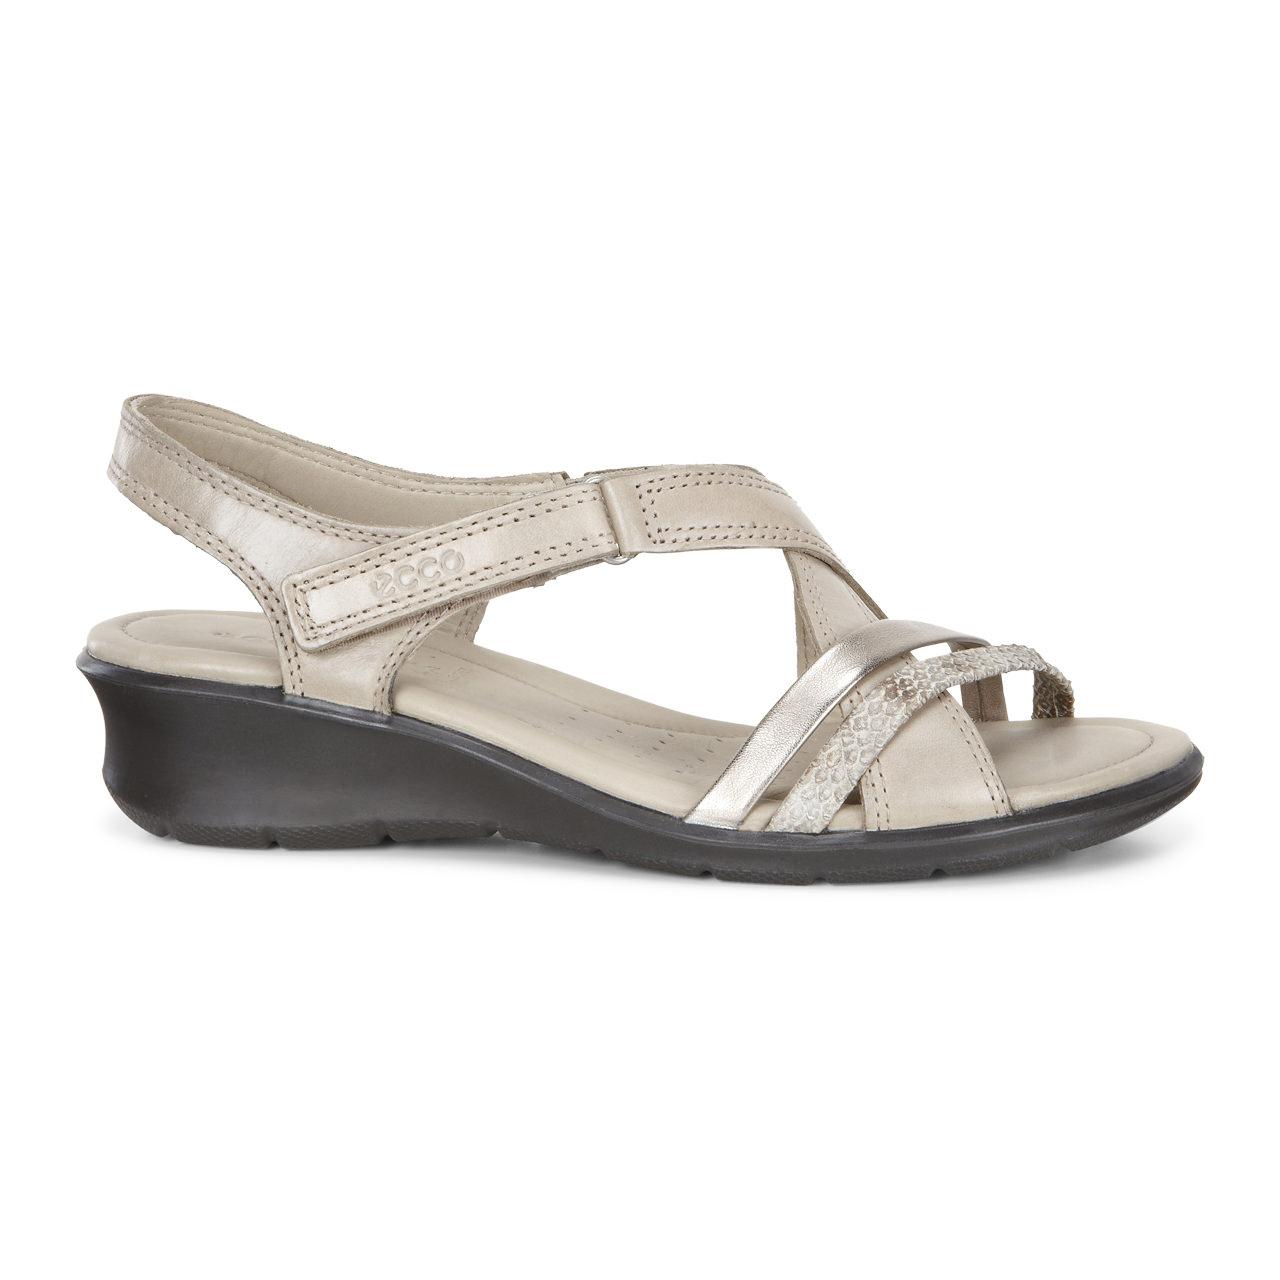 Sandal Shoes Felicia Womens Nz Qmvuspz Ecco Shop rWEodxBQeC